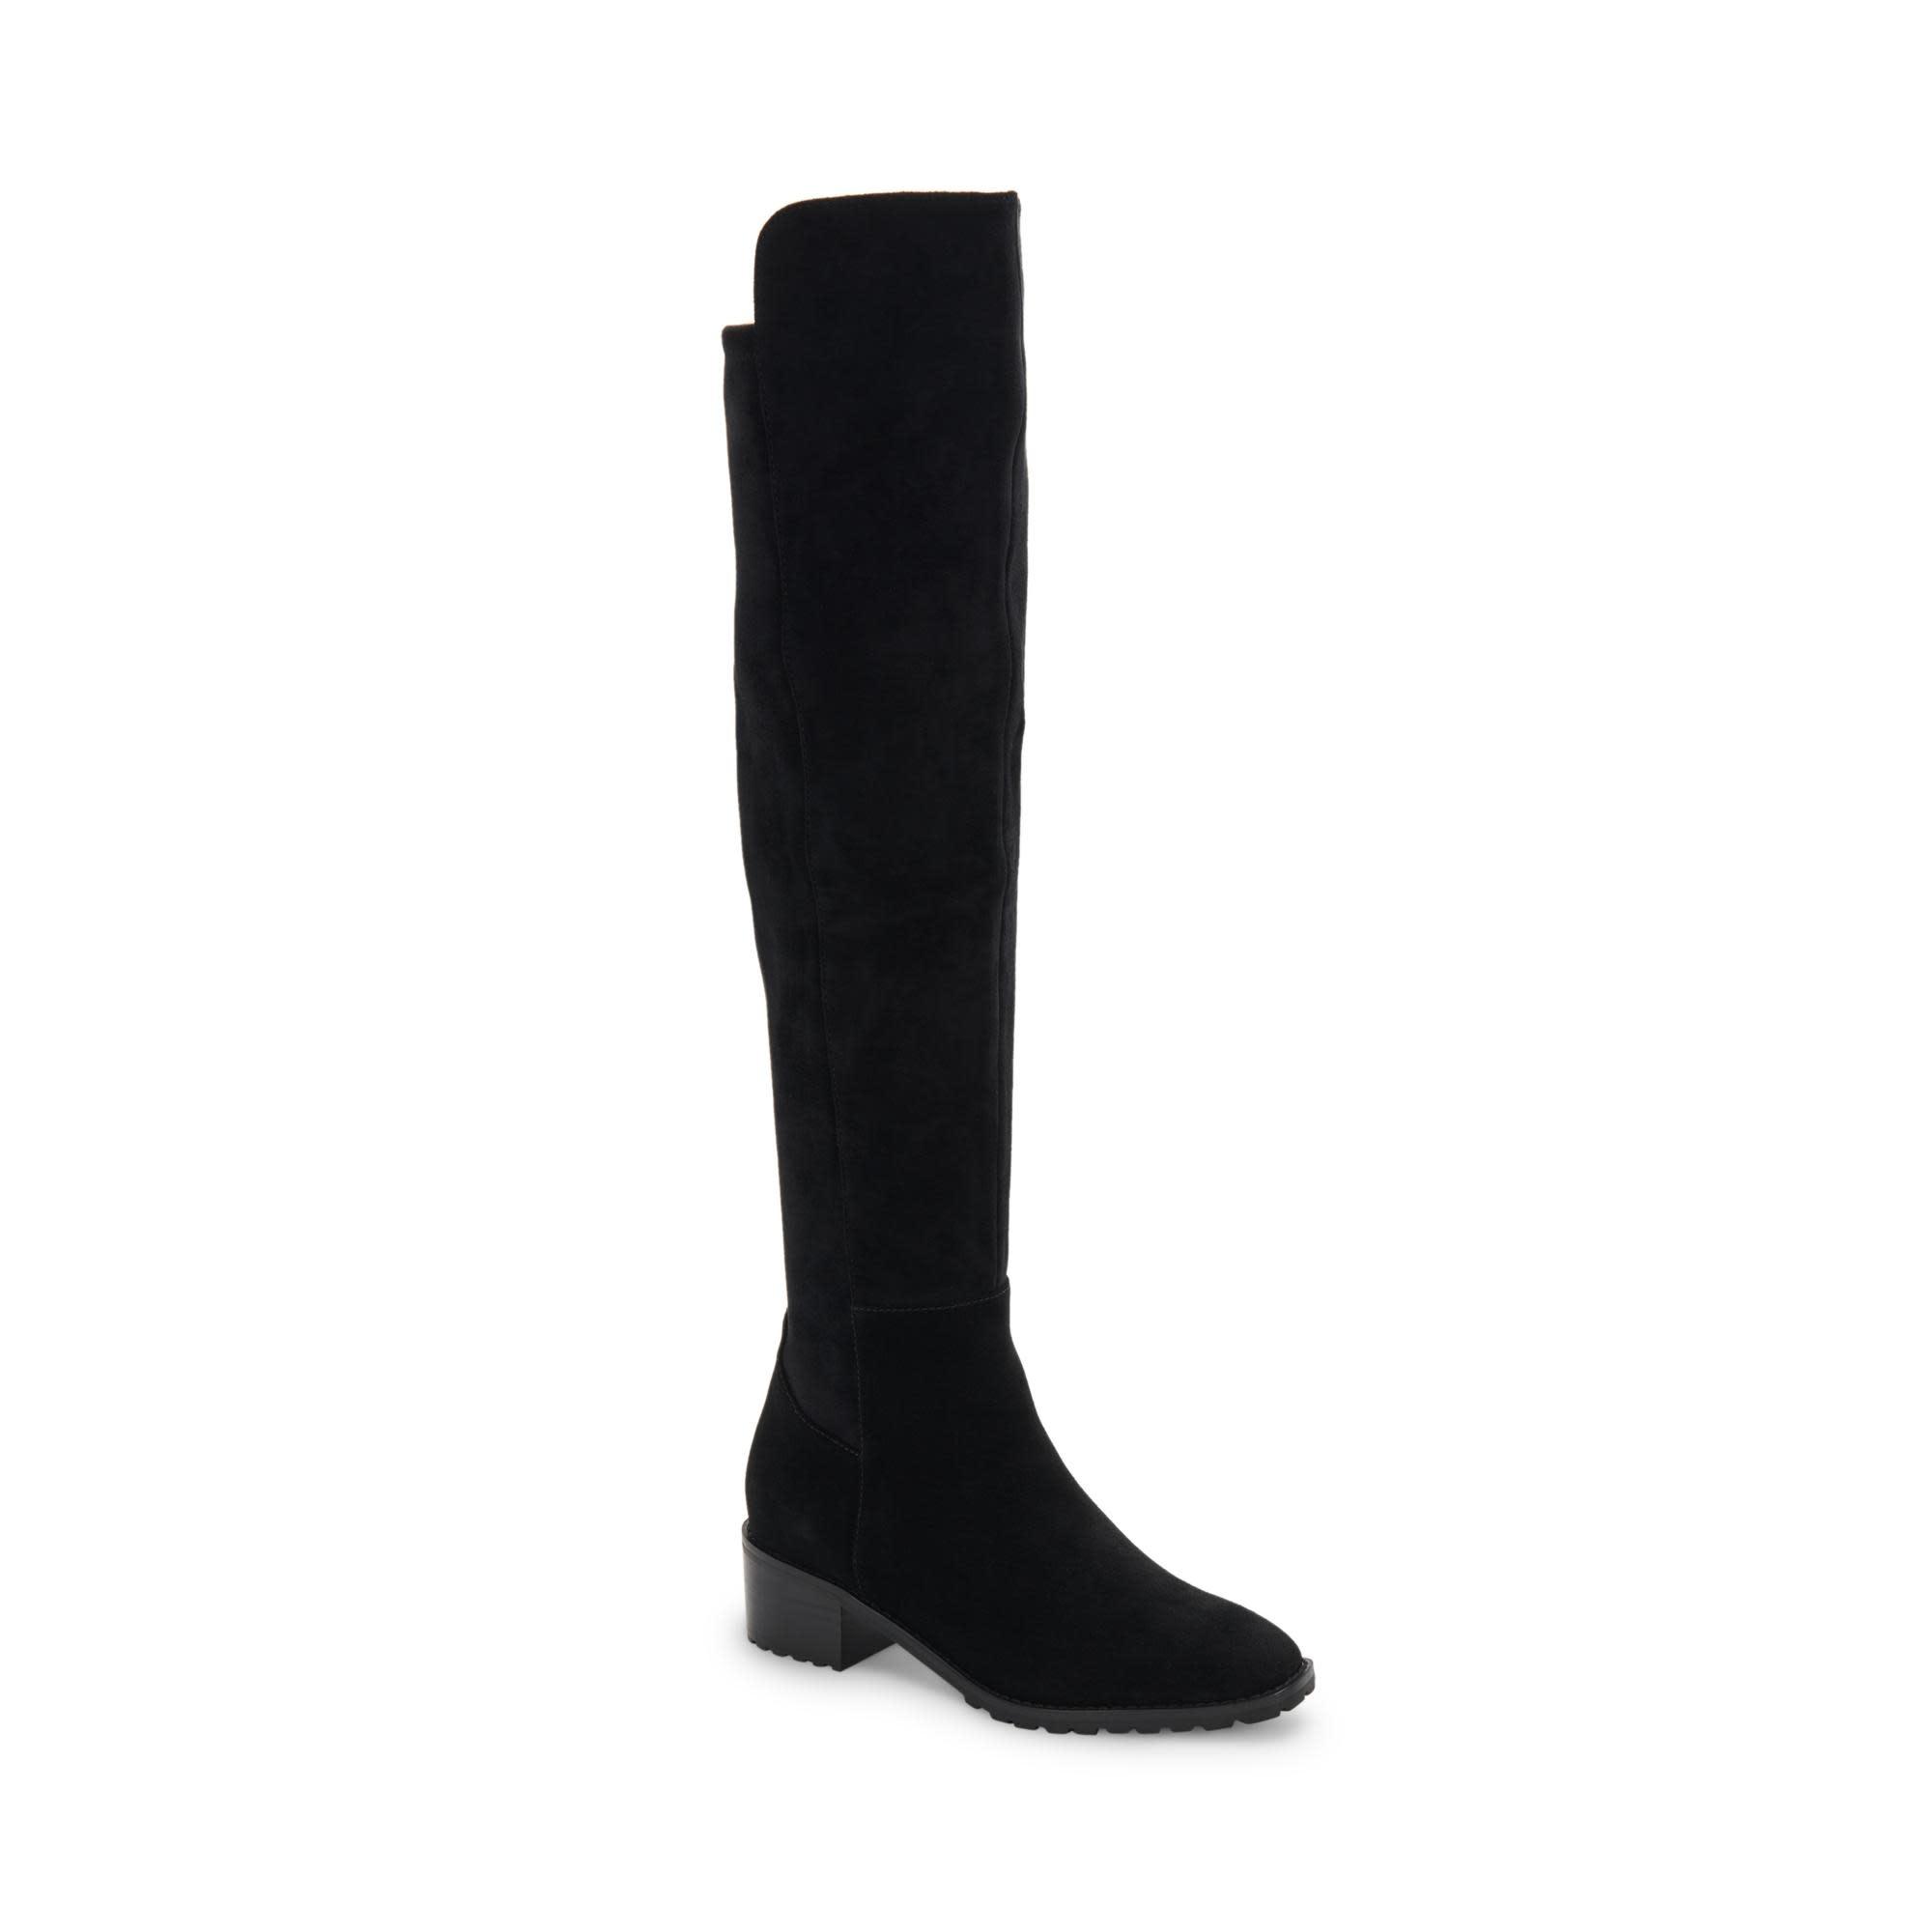 Sierra Suede Tall Boot